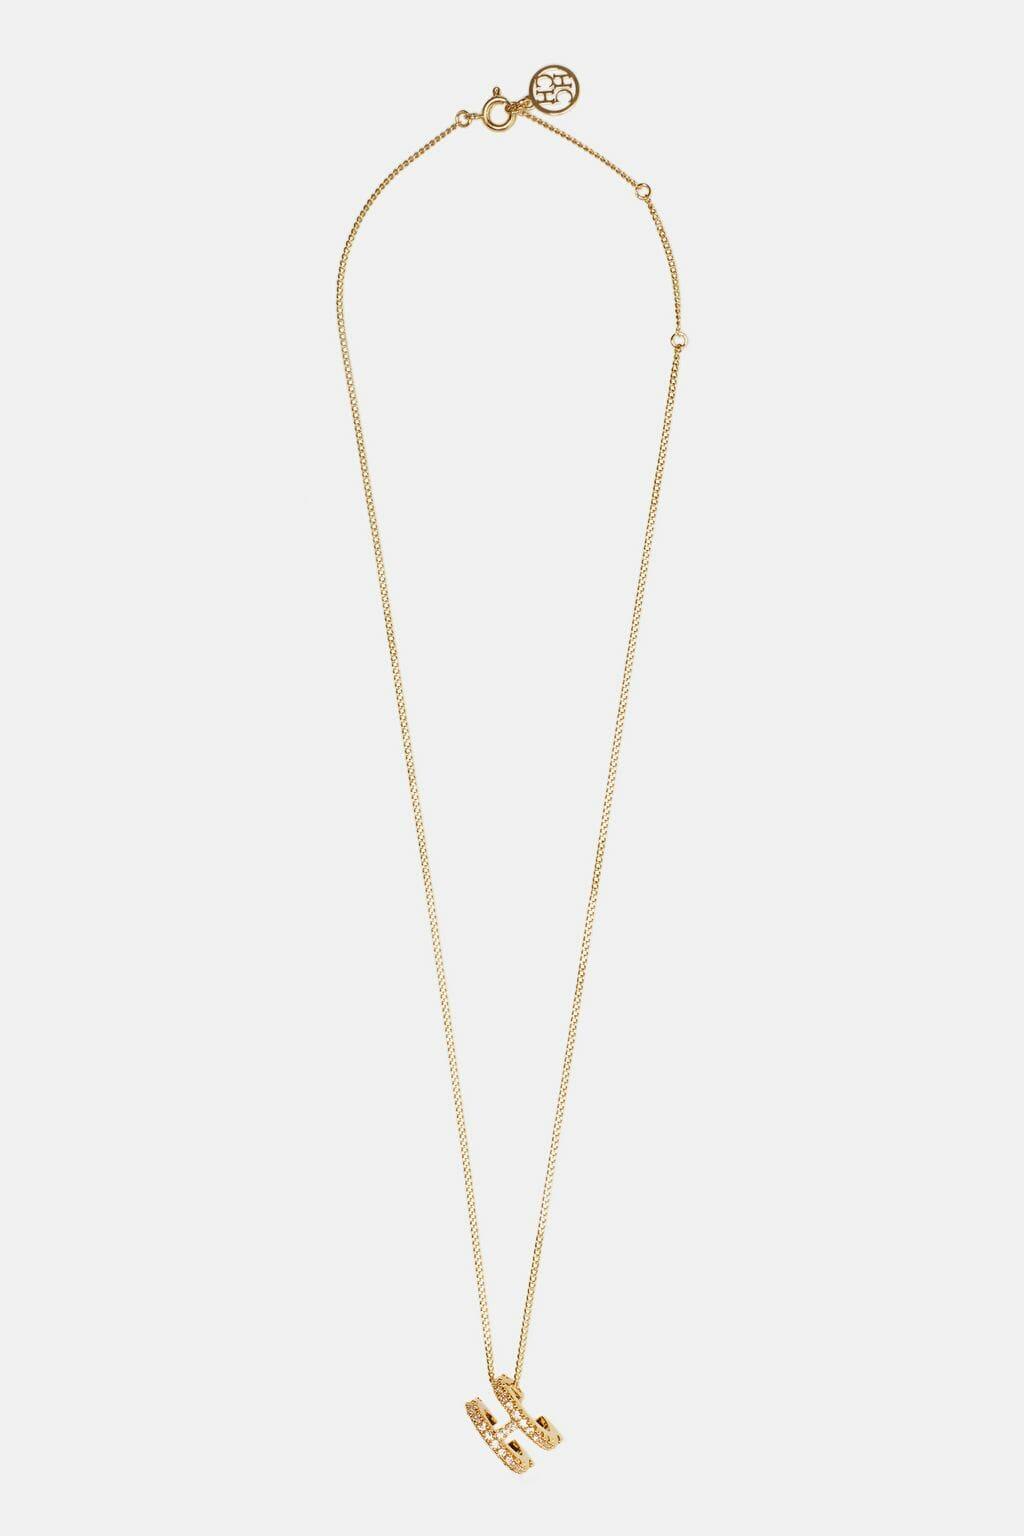 CH-Carolina-herrera-insignia-jewelry-look-21